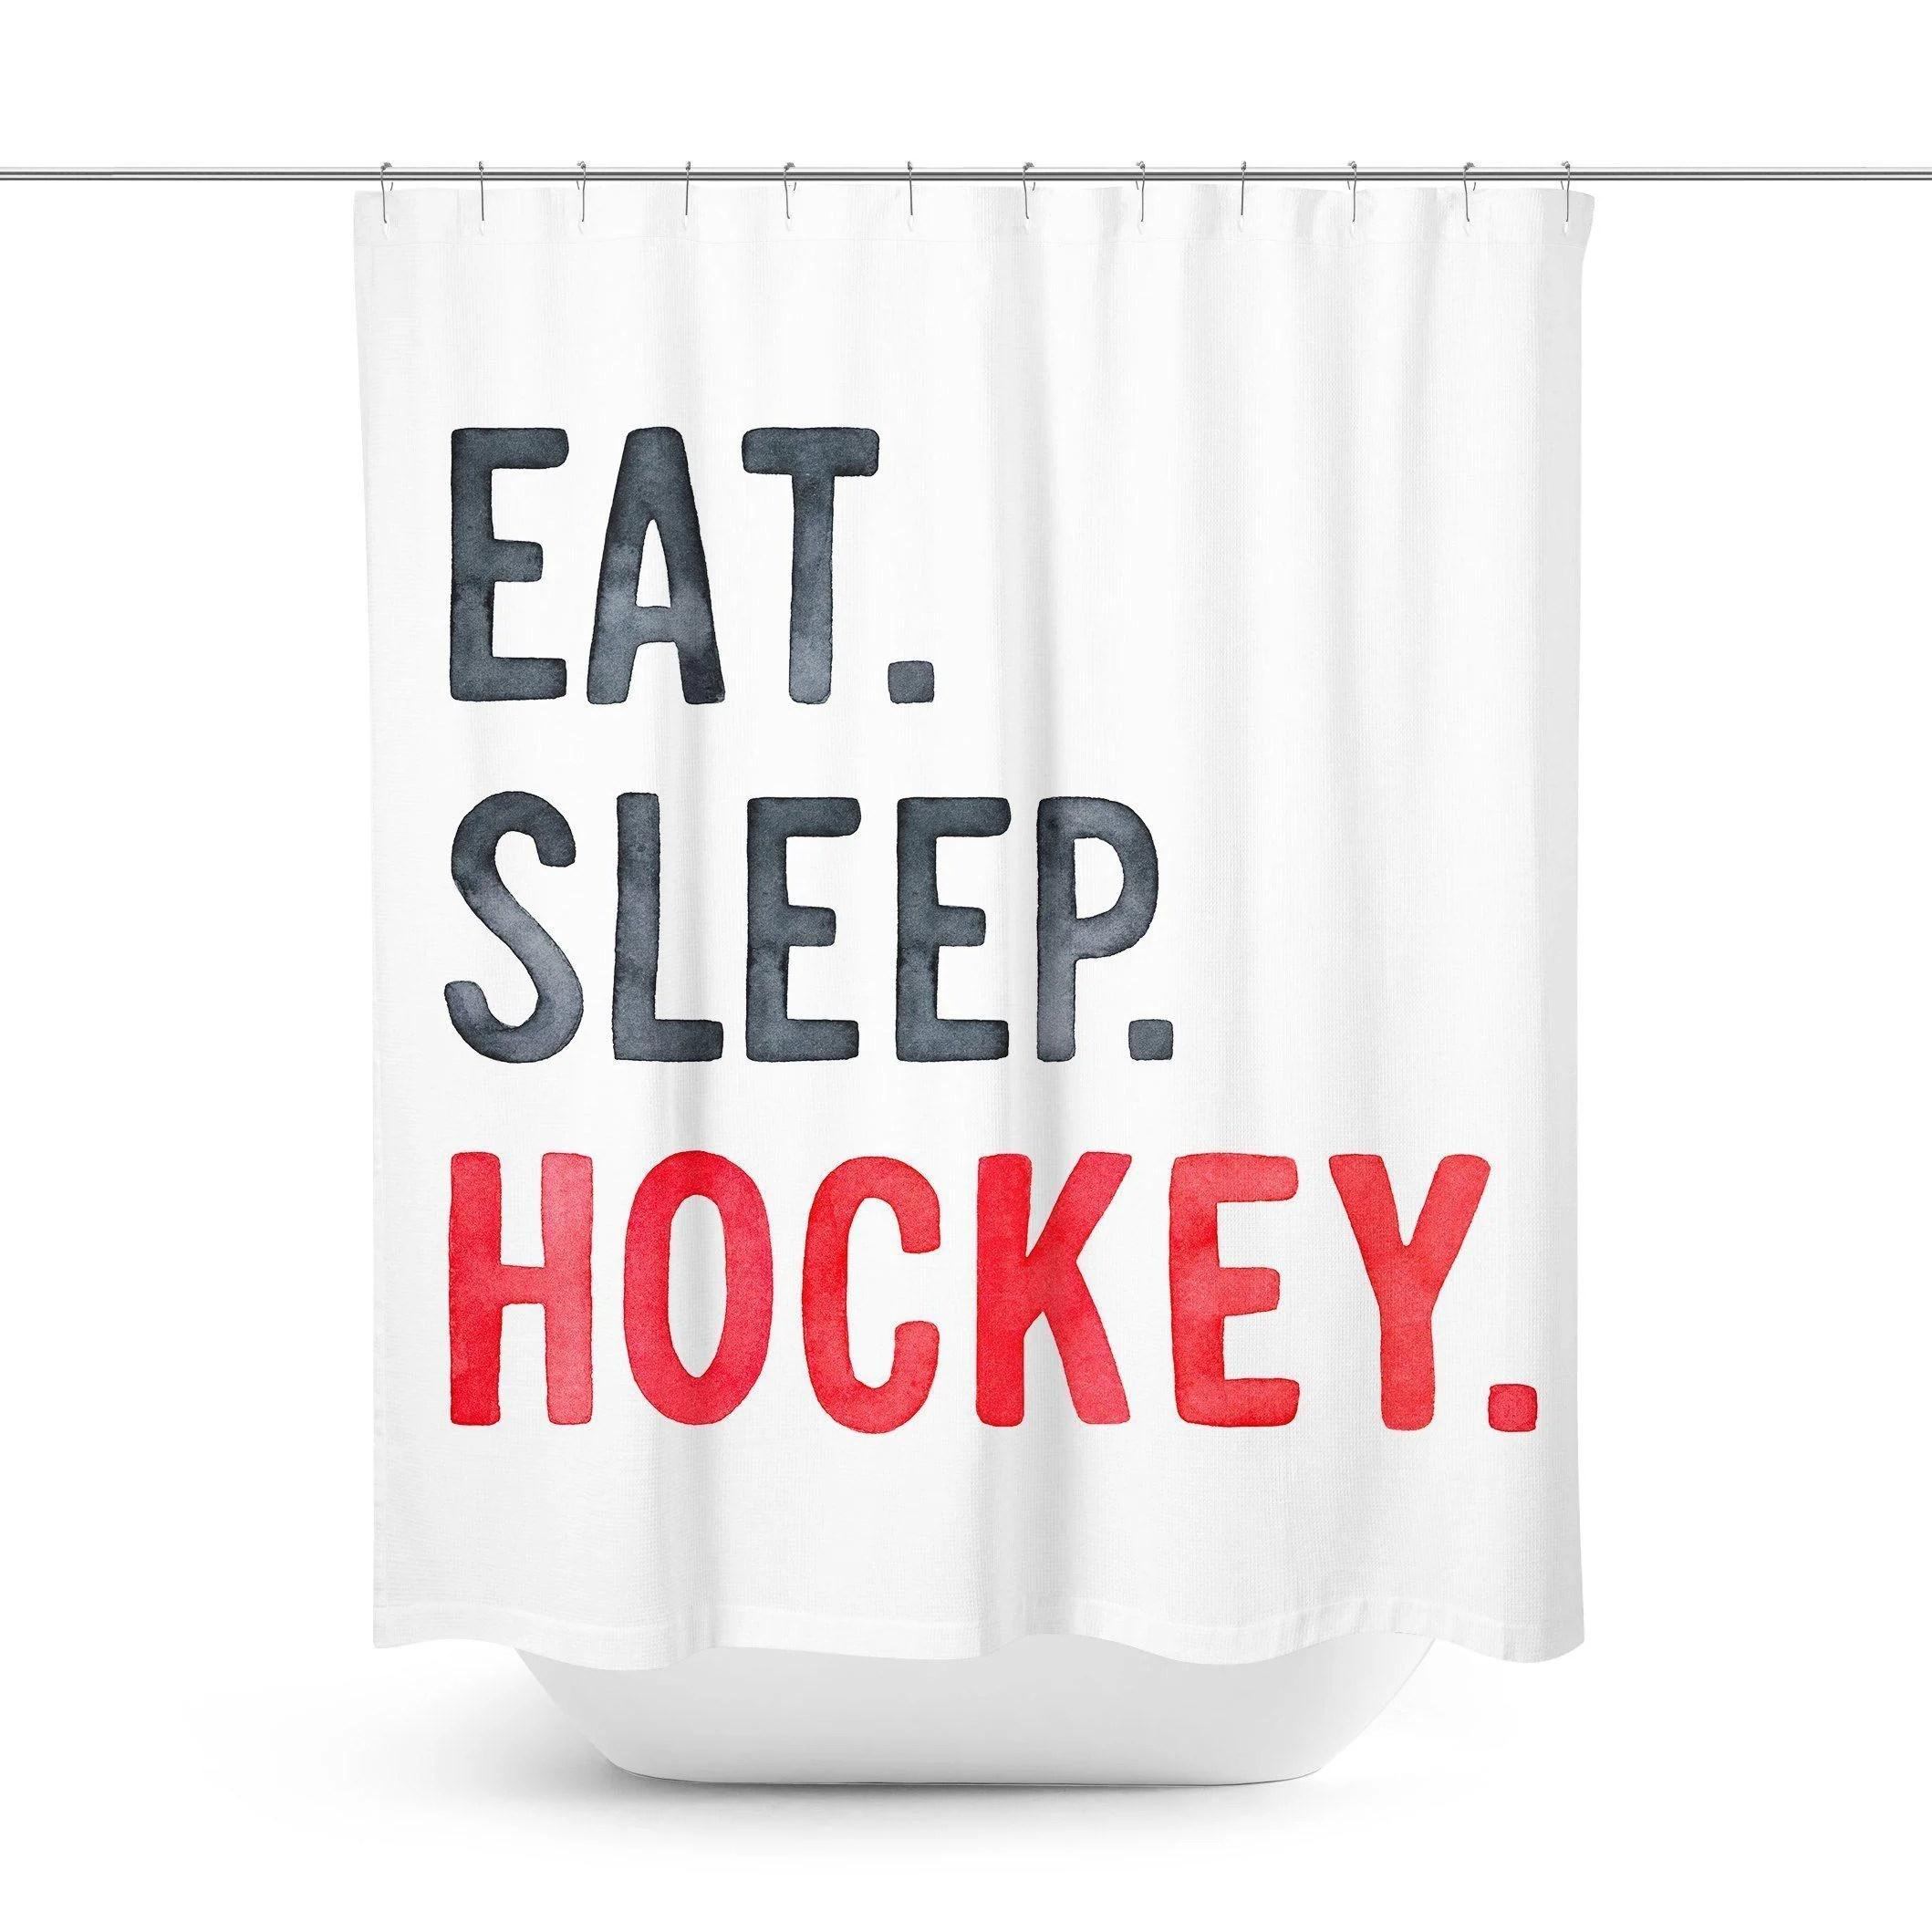 ice hockey shower curtain